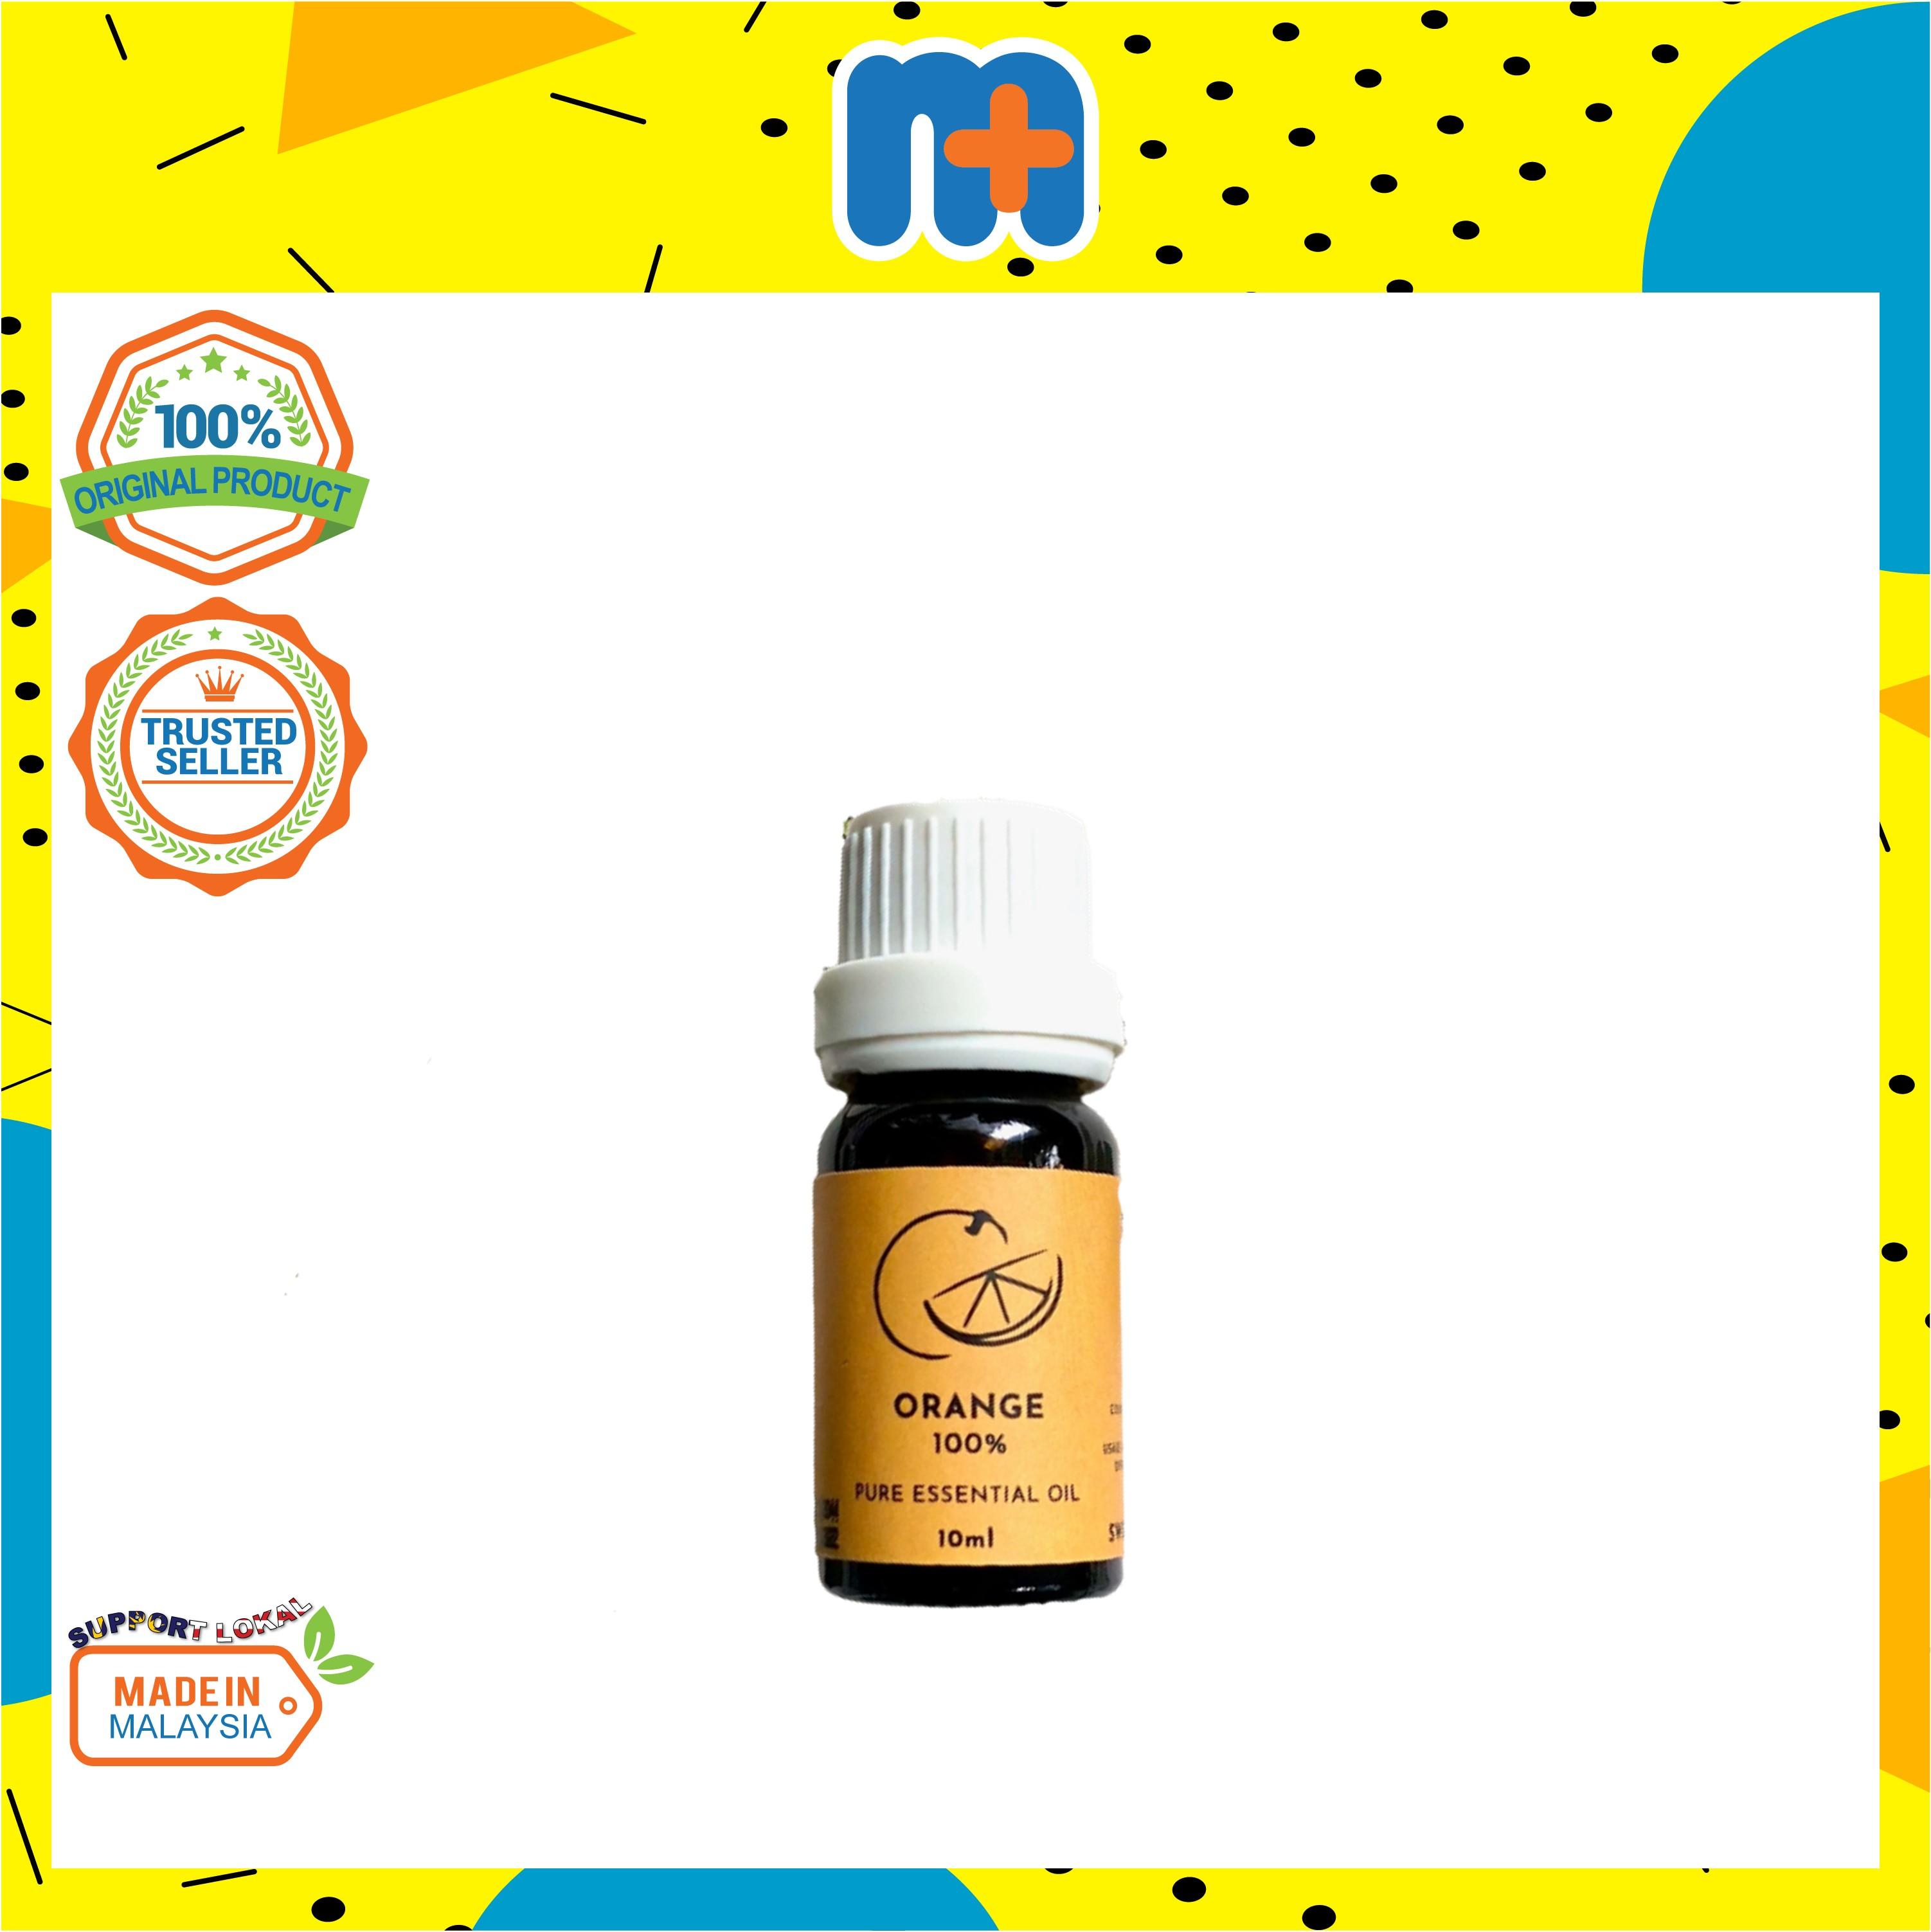 [MPLUS] PLANTSENSE Orange 100% Pure Essential Oil 10ml